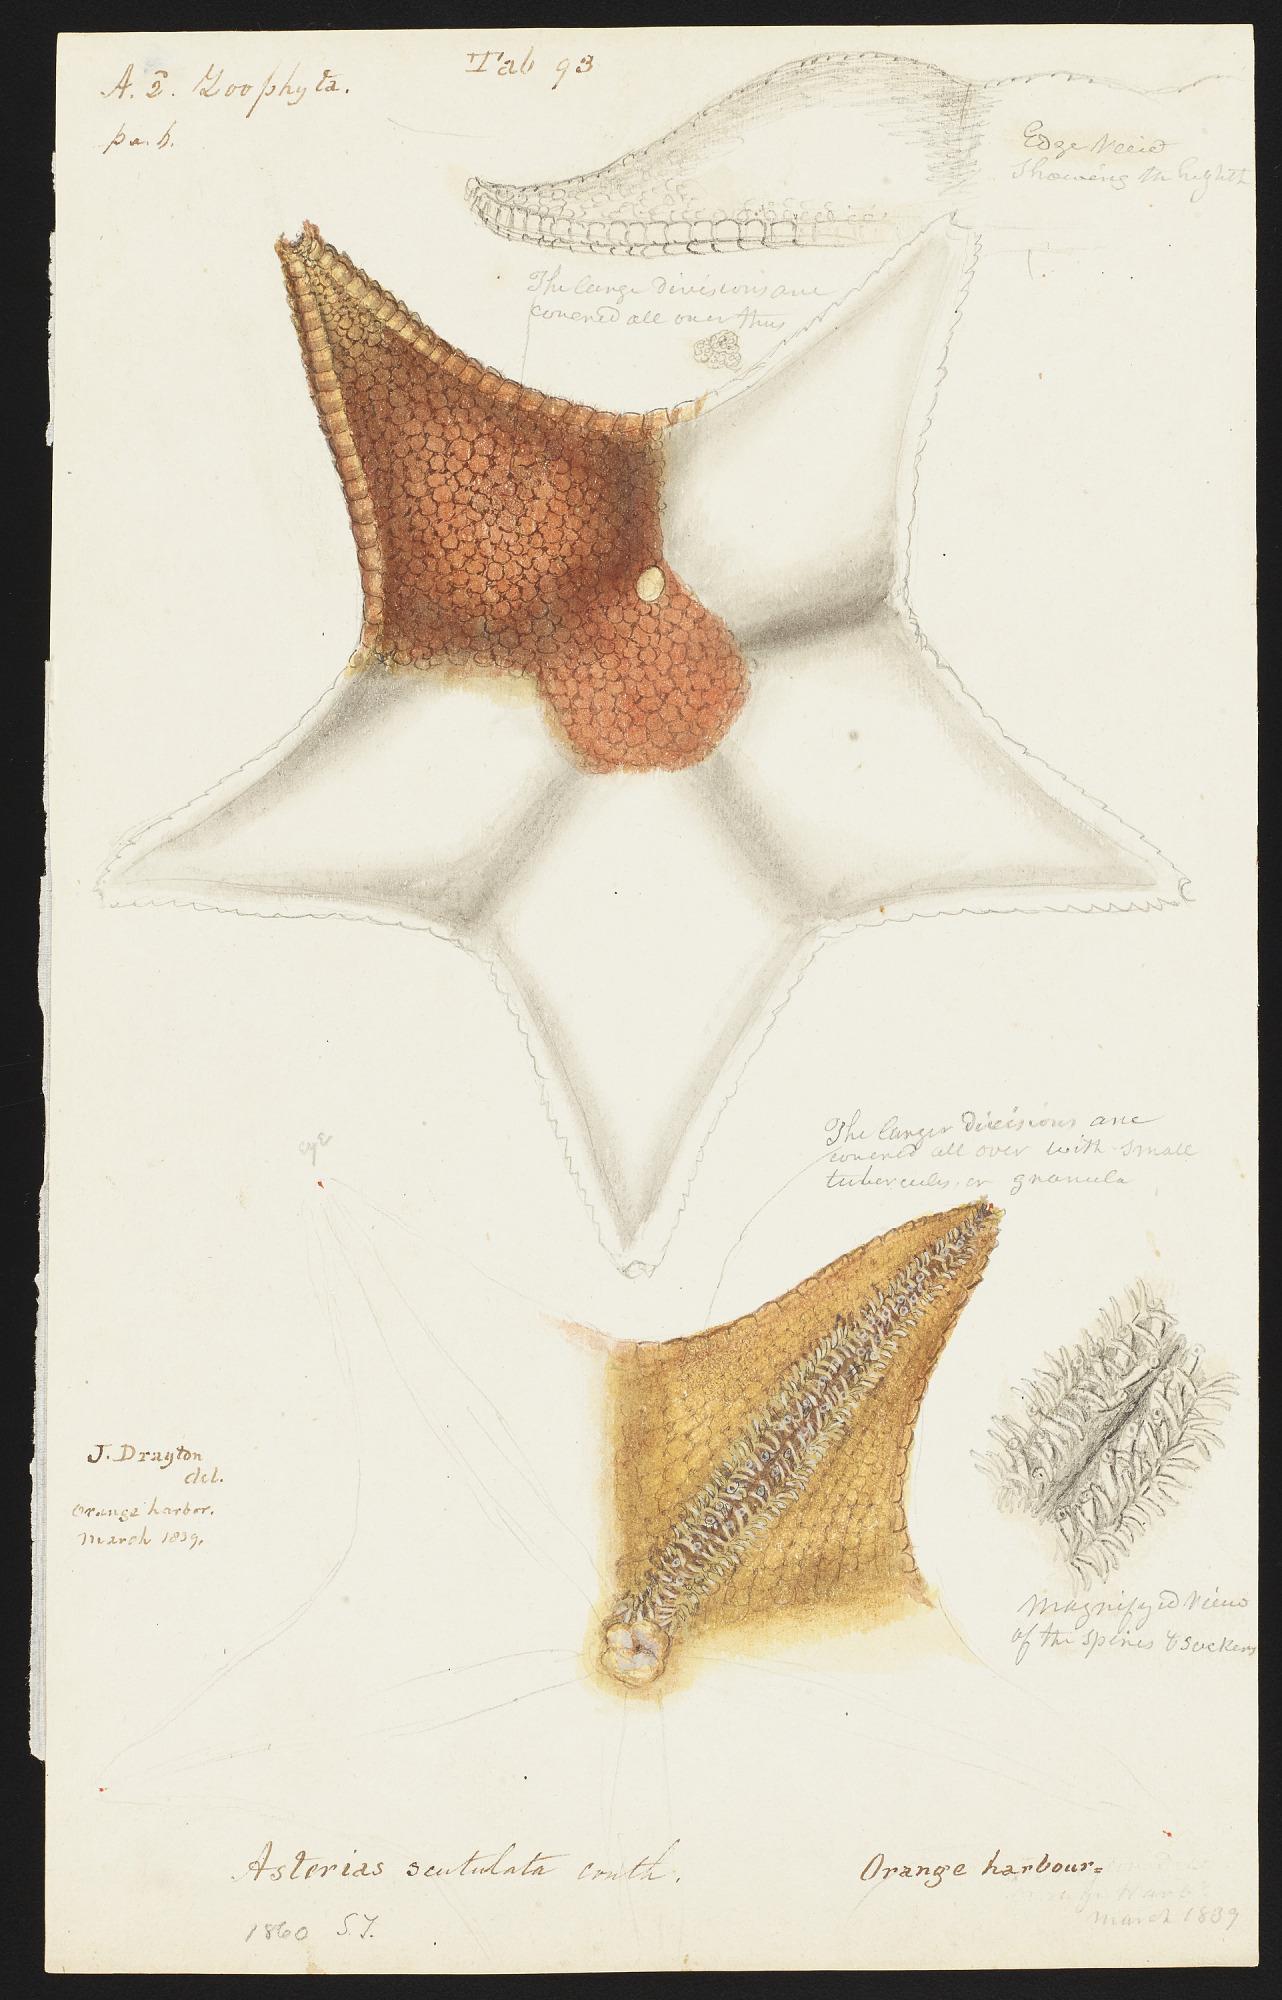 Echinoderms, drawings by Joseph Drayton, 1838-1839, Smithsonian Field Book Project, SIA RU007186.